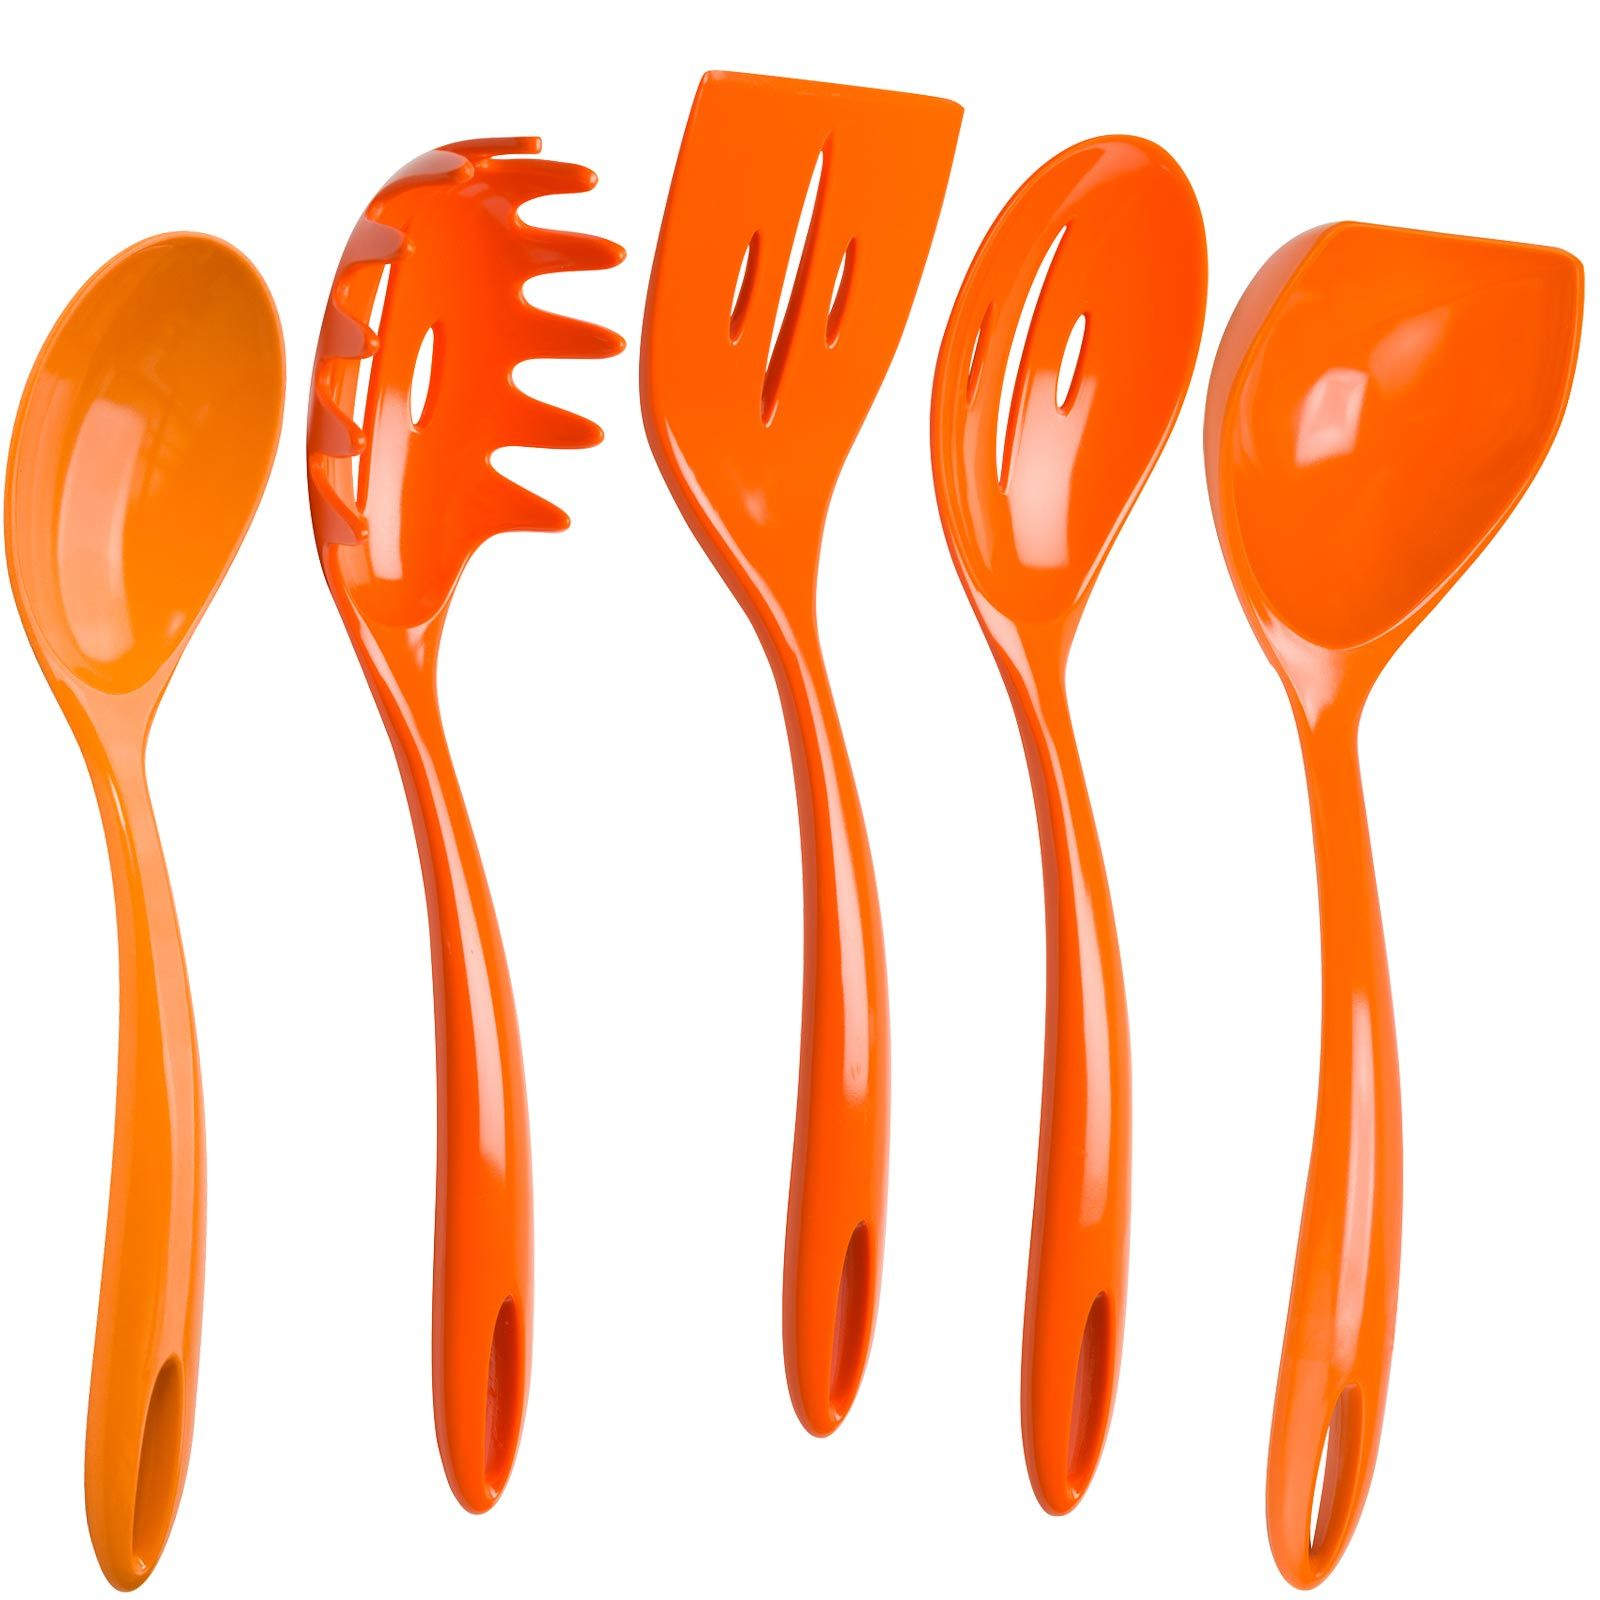 Beau Orange Kitchen Utensil Set Zak Designs